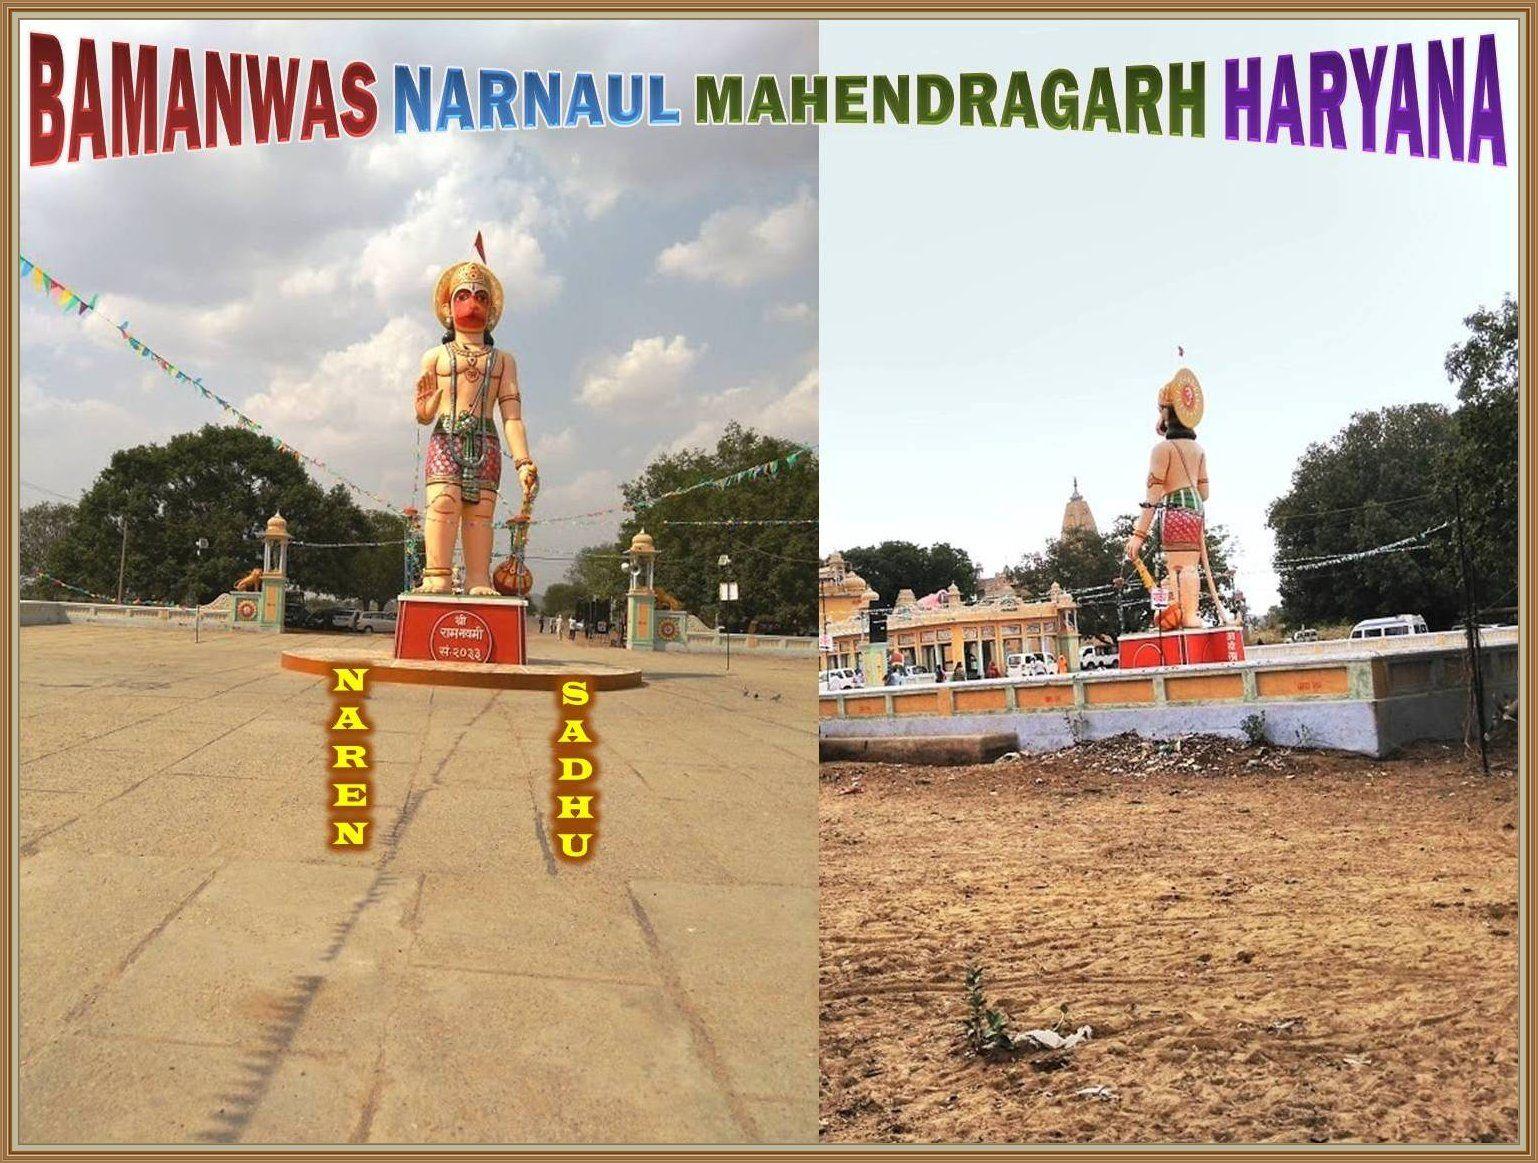 40 Feet Height Cloud Talking Sculpture Of Lord Hanuman On The Main